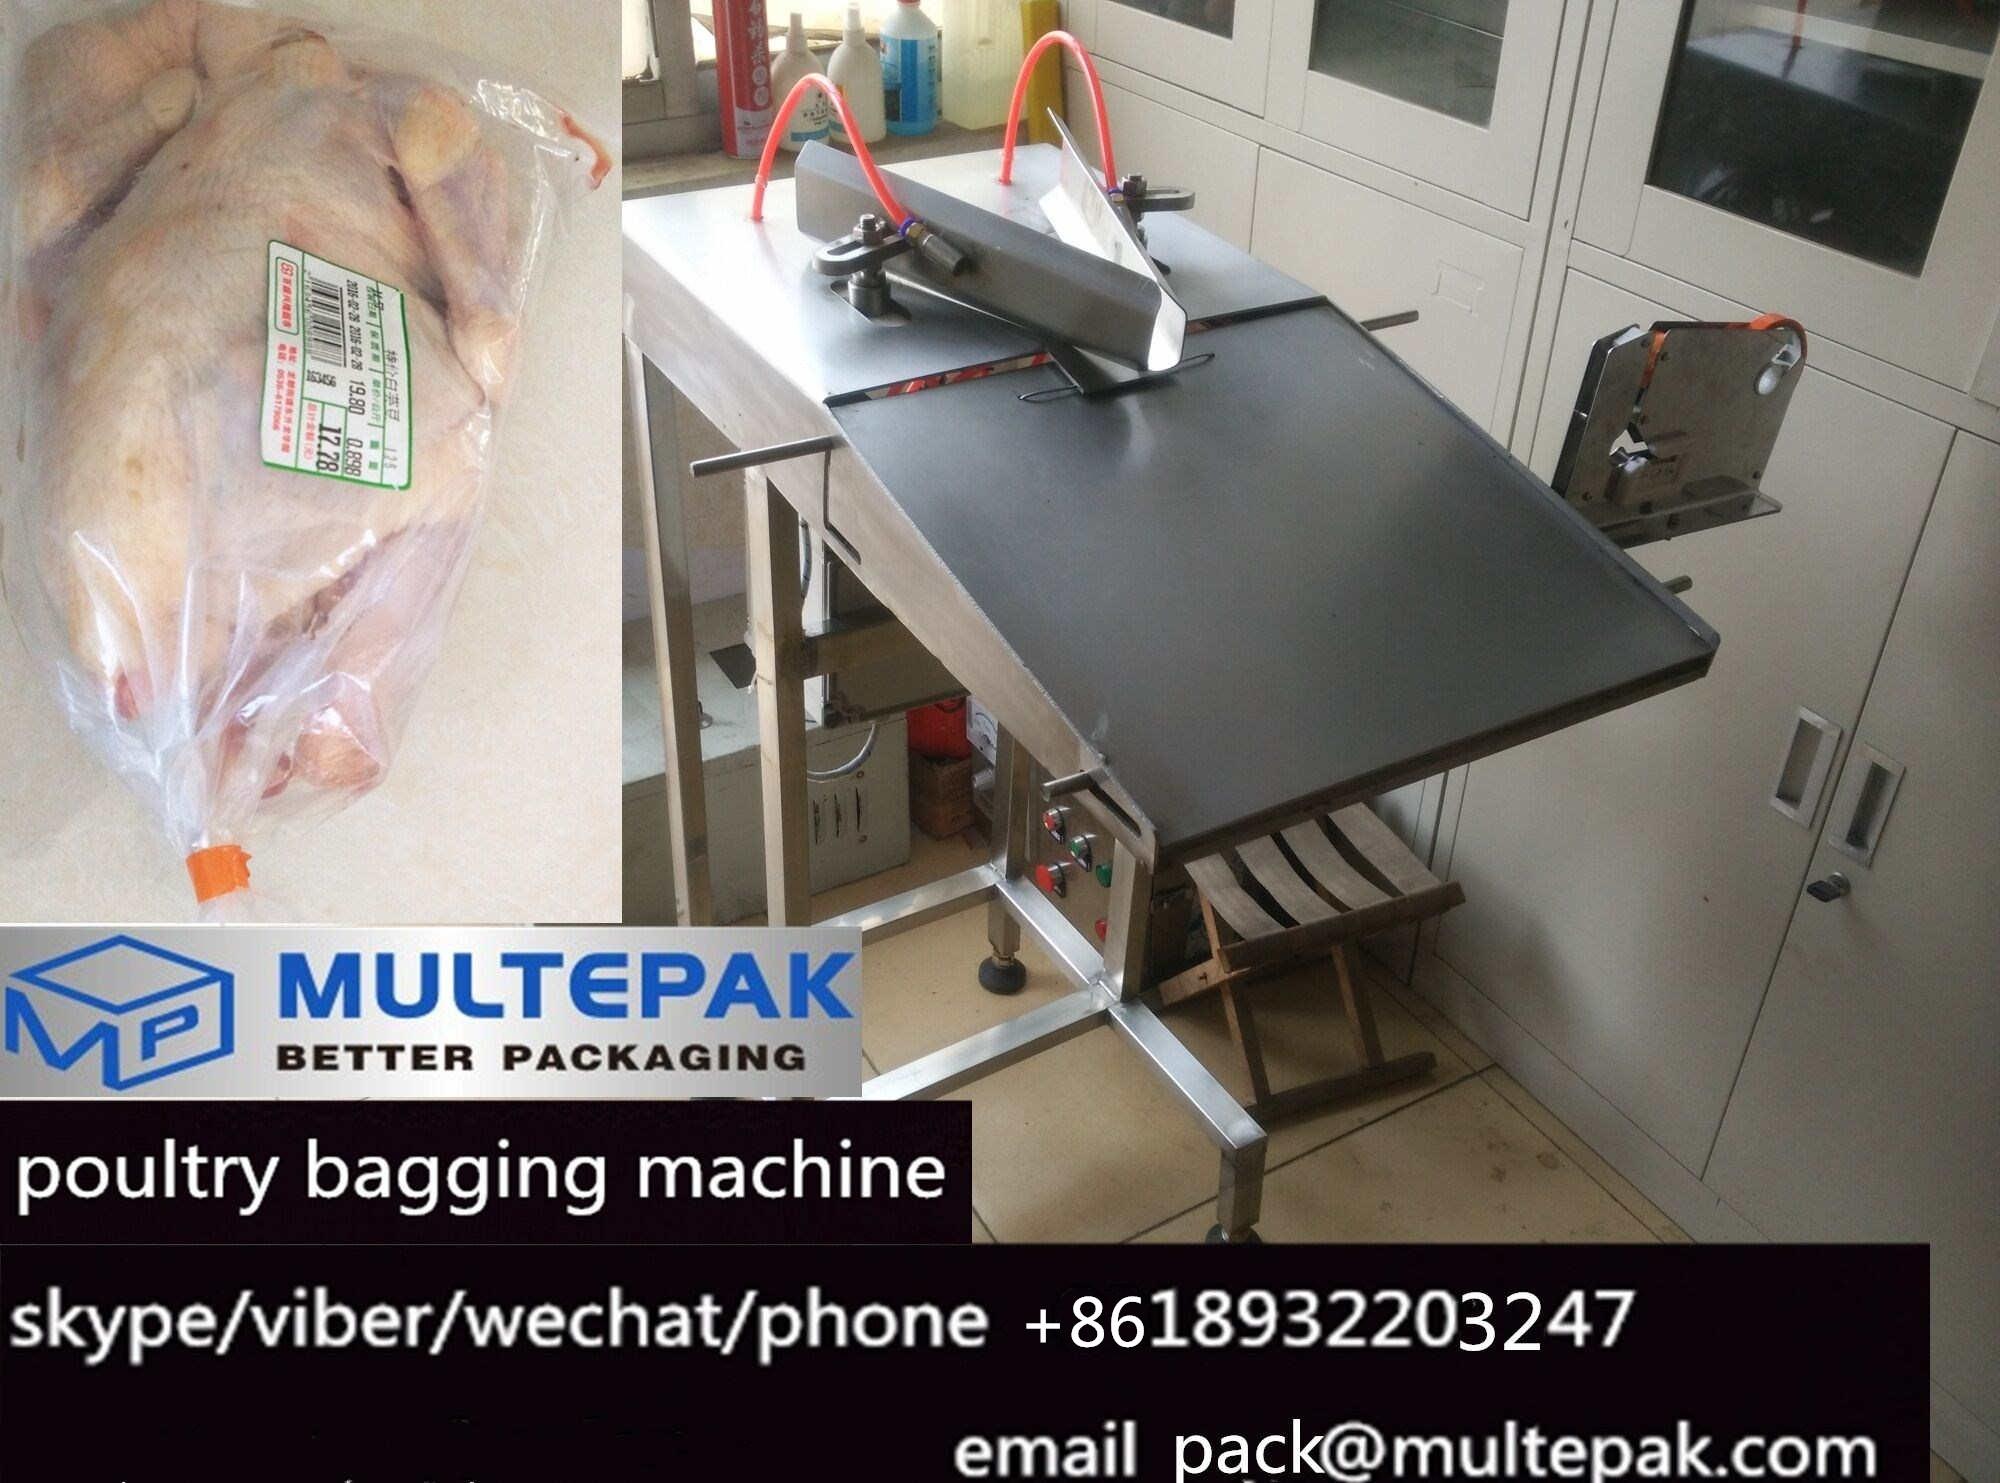 multepak poultry bagging machine